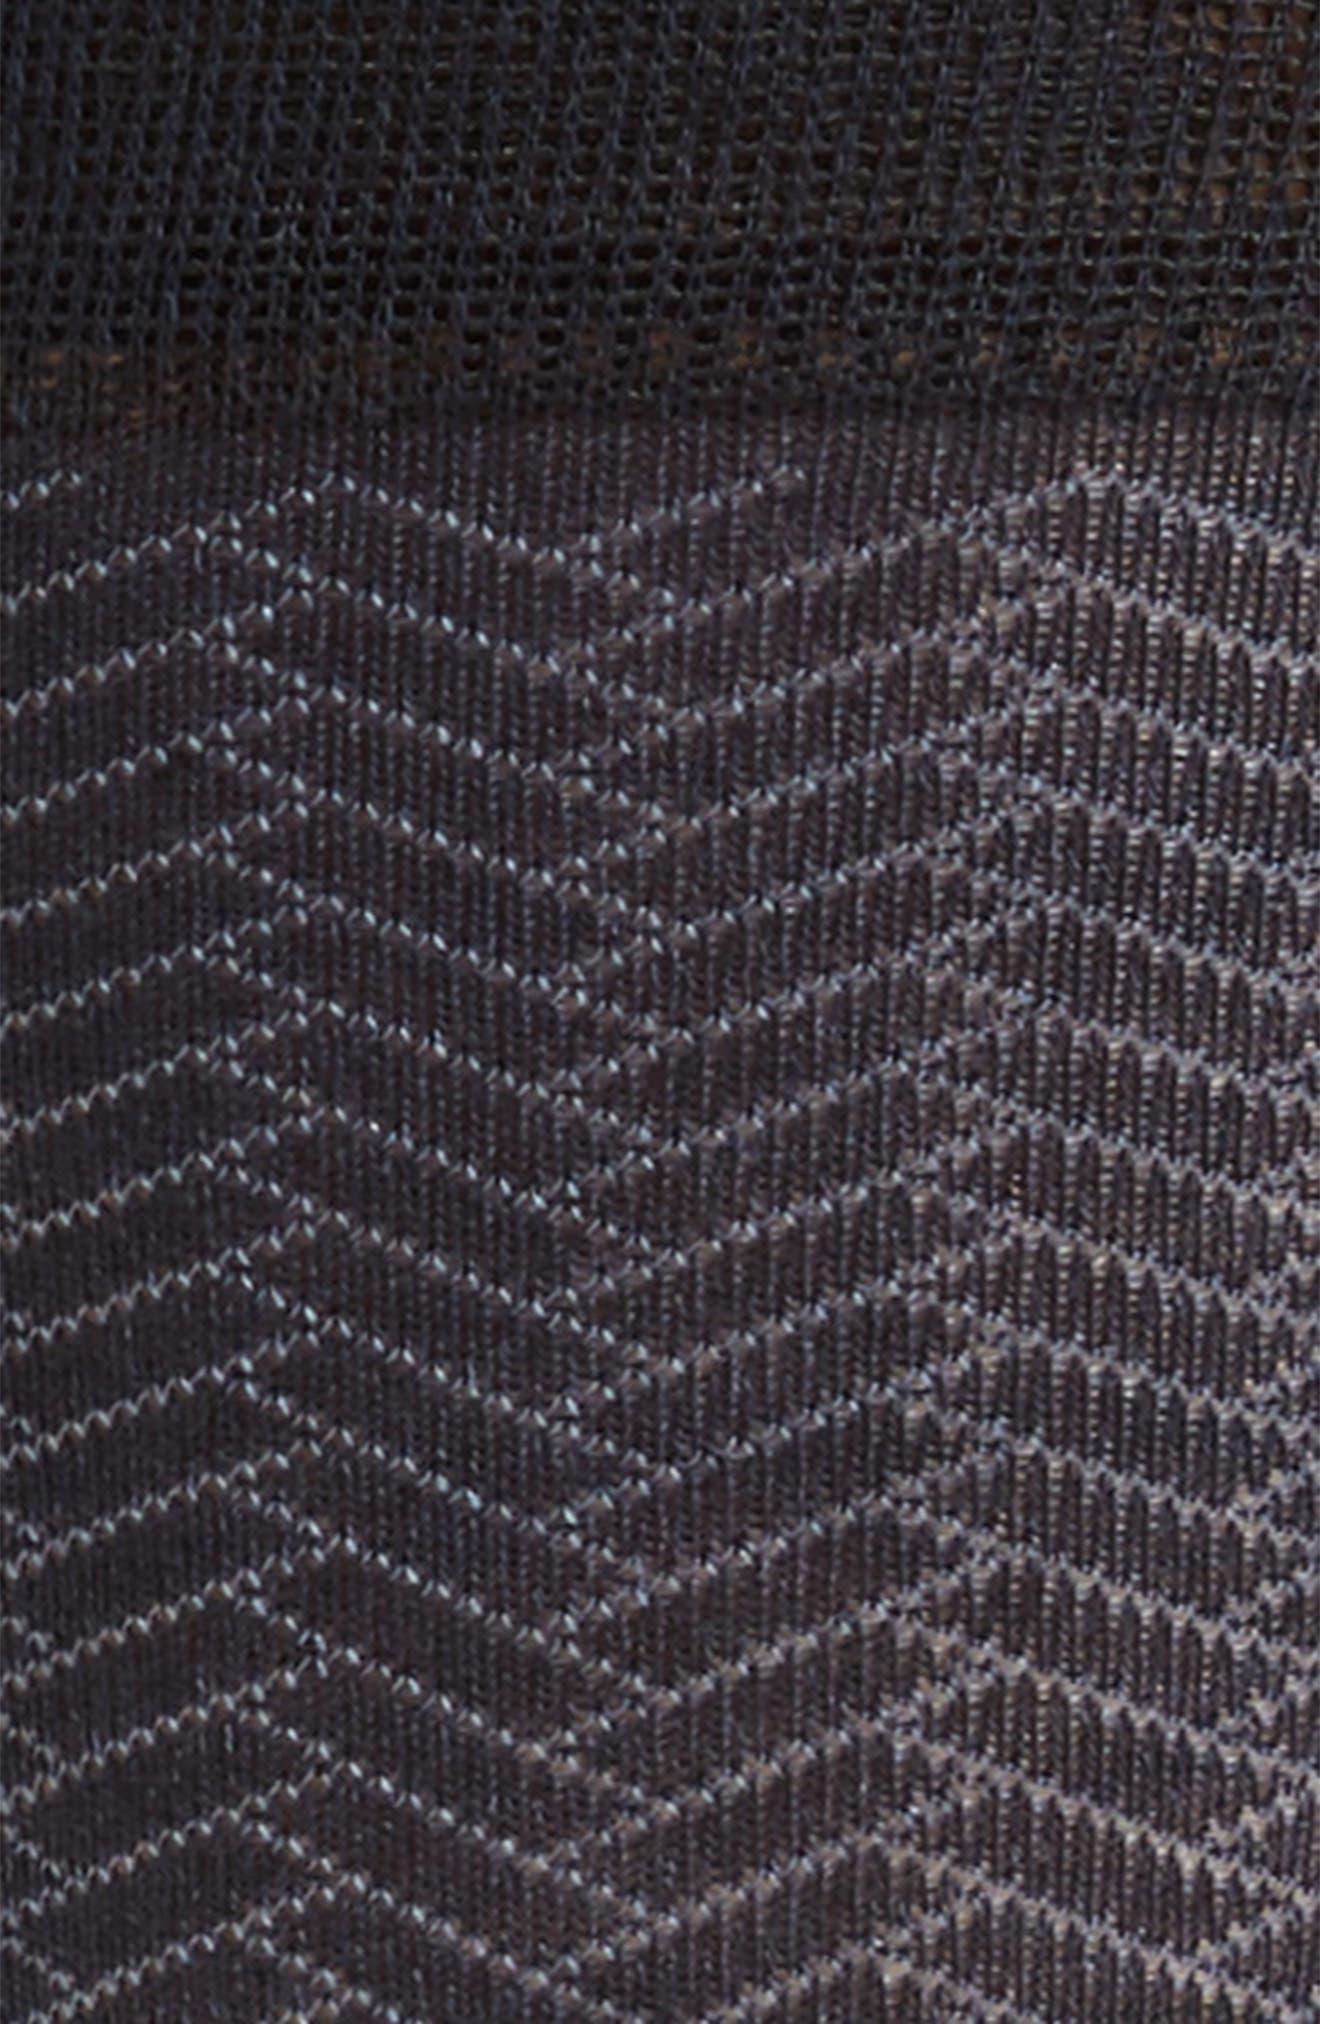 Geometric Crew Socks,                             Alternate thumbnail 2, color,                             NAVY